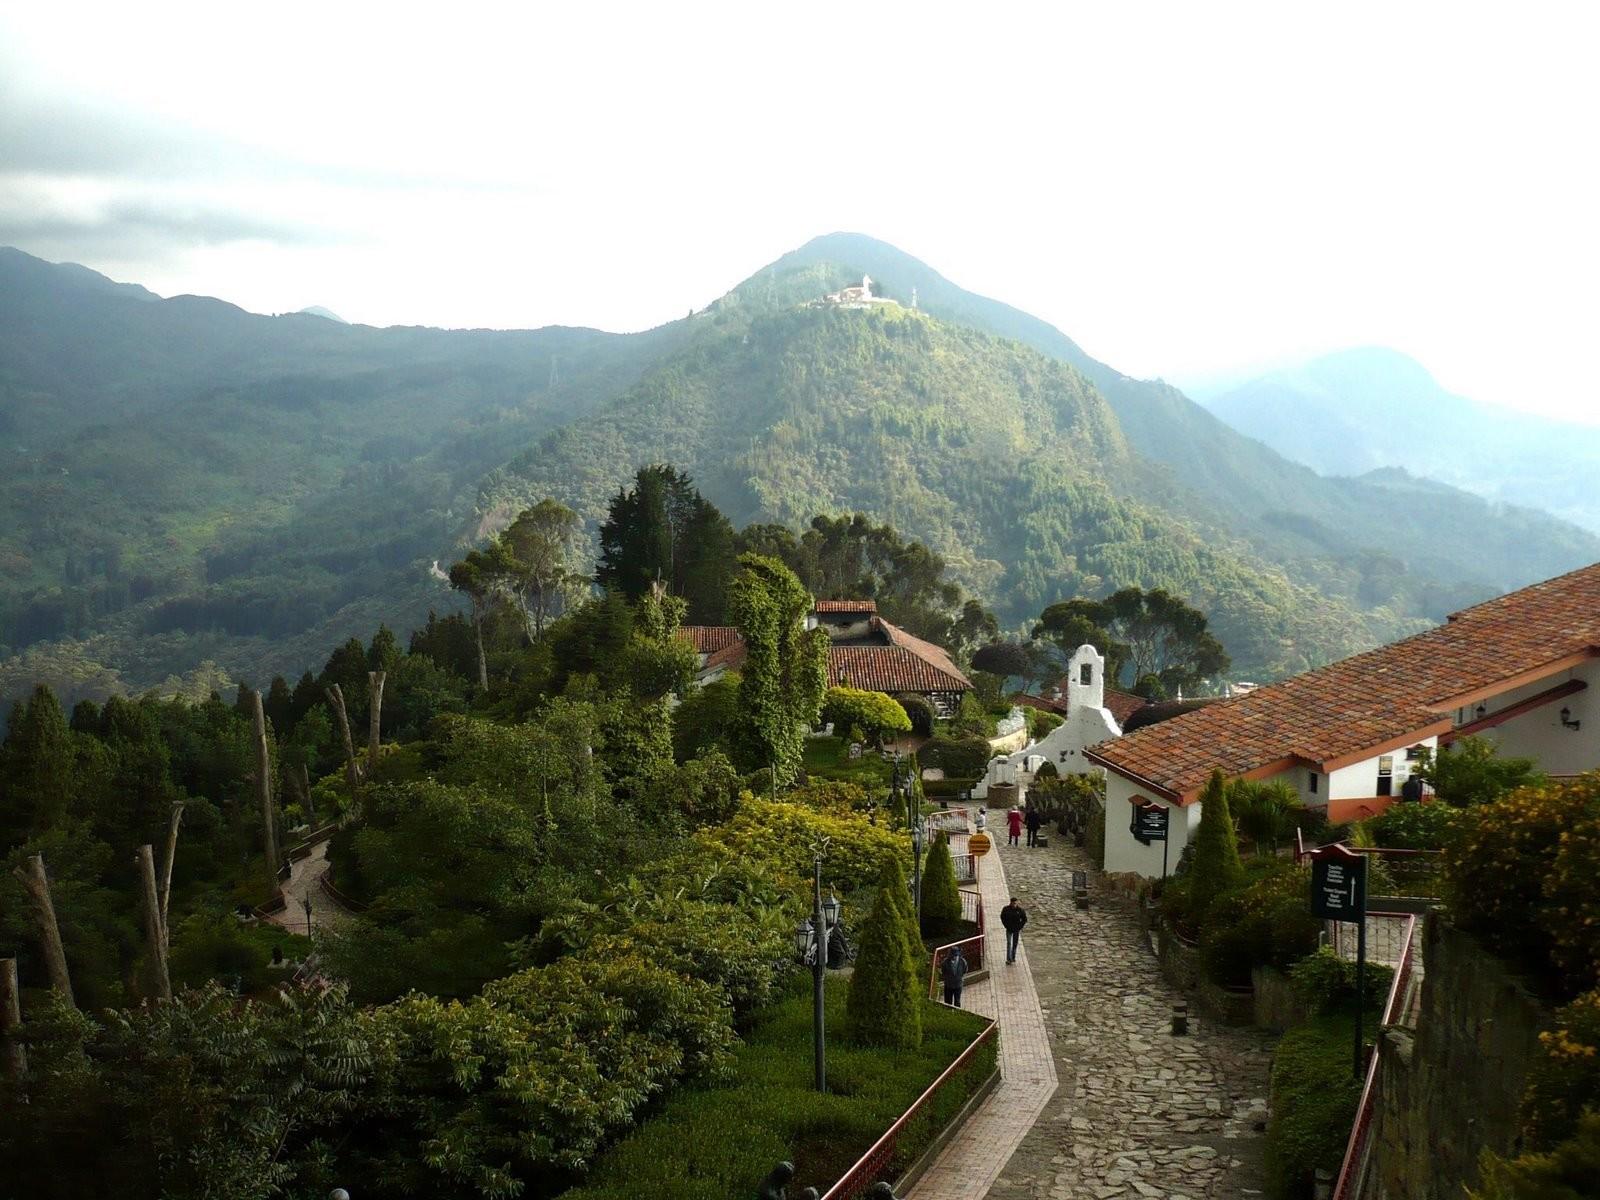 Esperienza a Santafé de Bogotá, Colombia, di Daniel